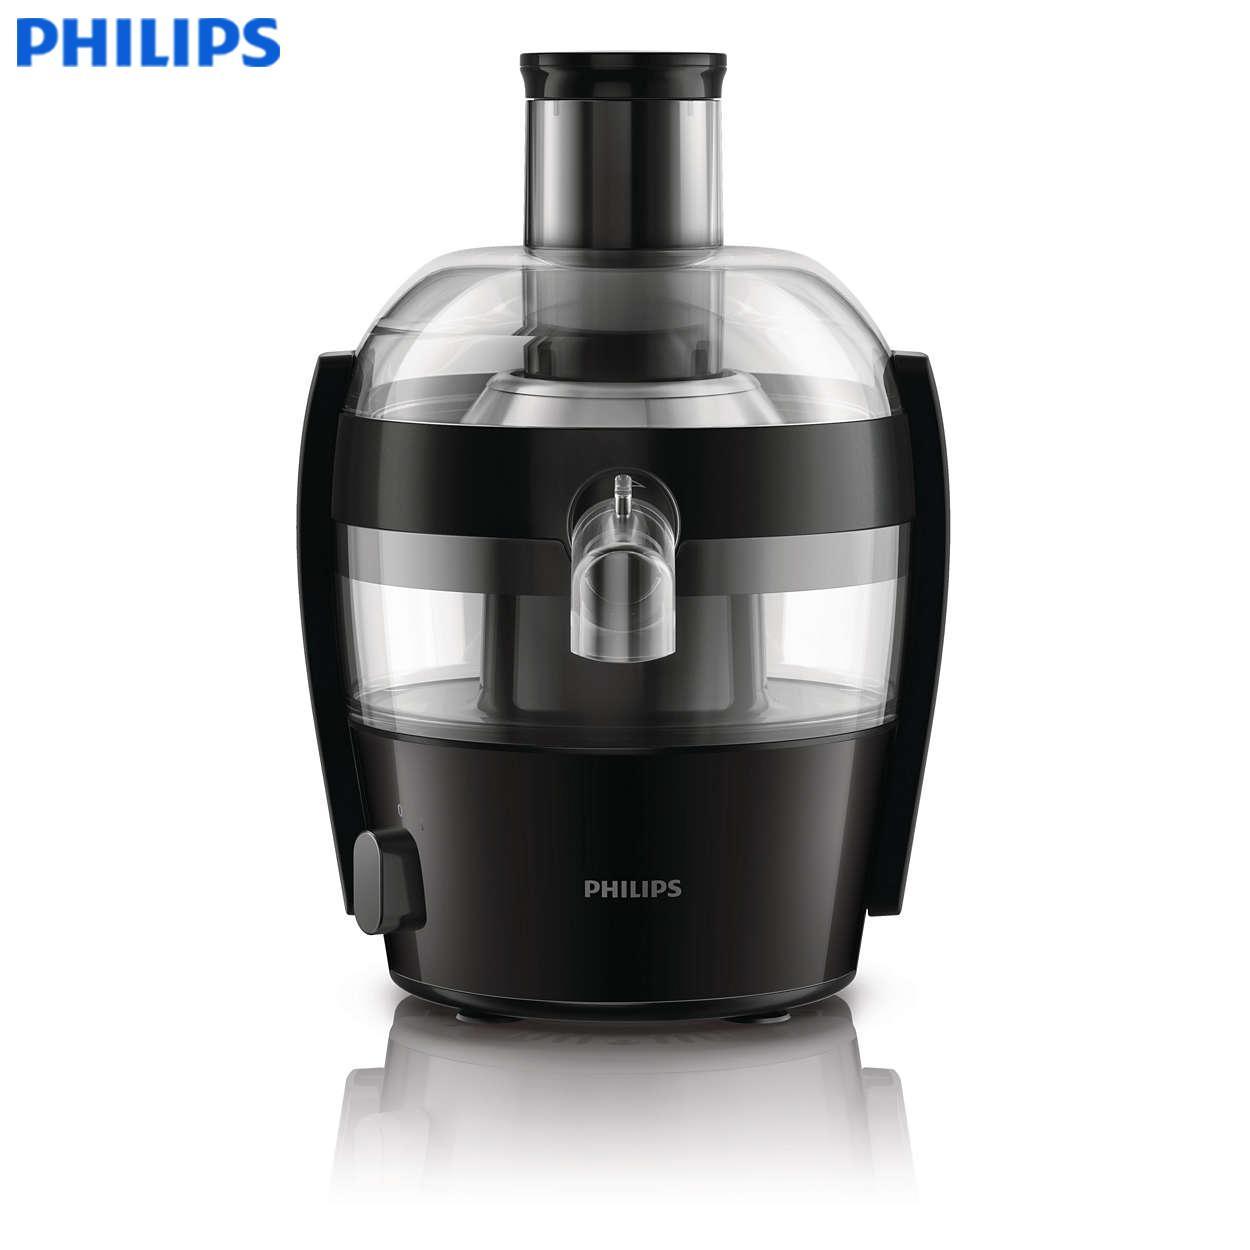 New Philips Viva Collection Juicer Hr1832 Black